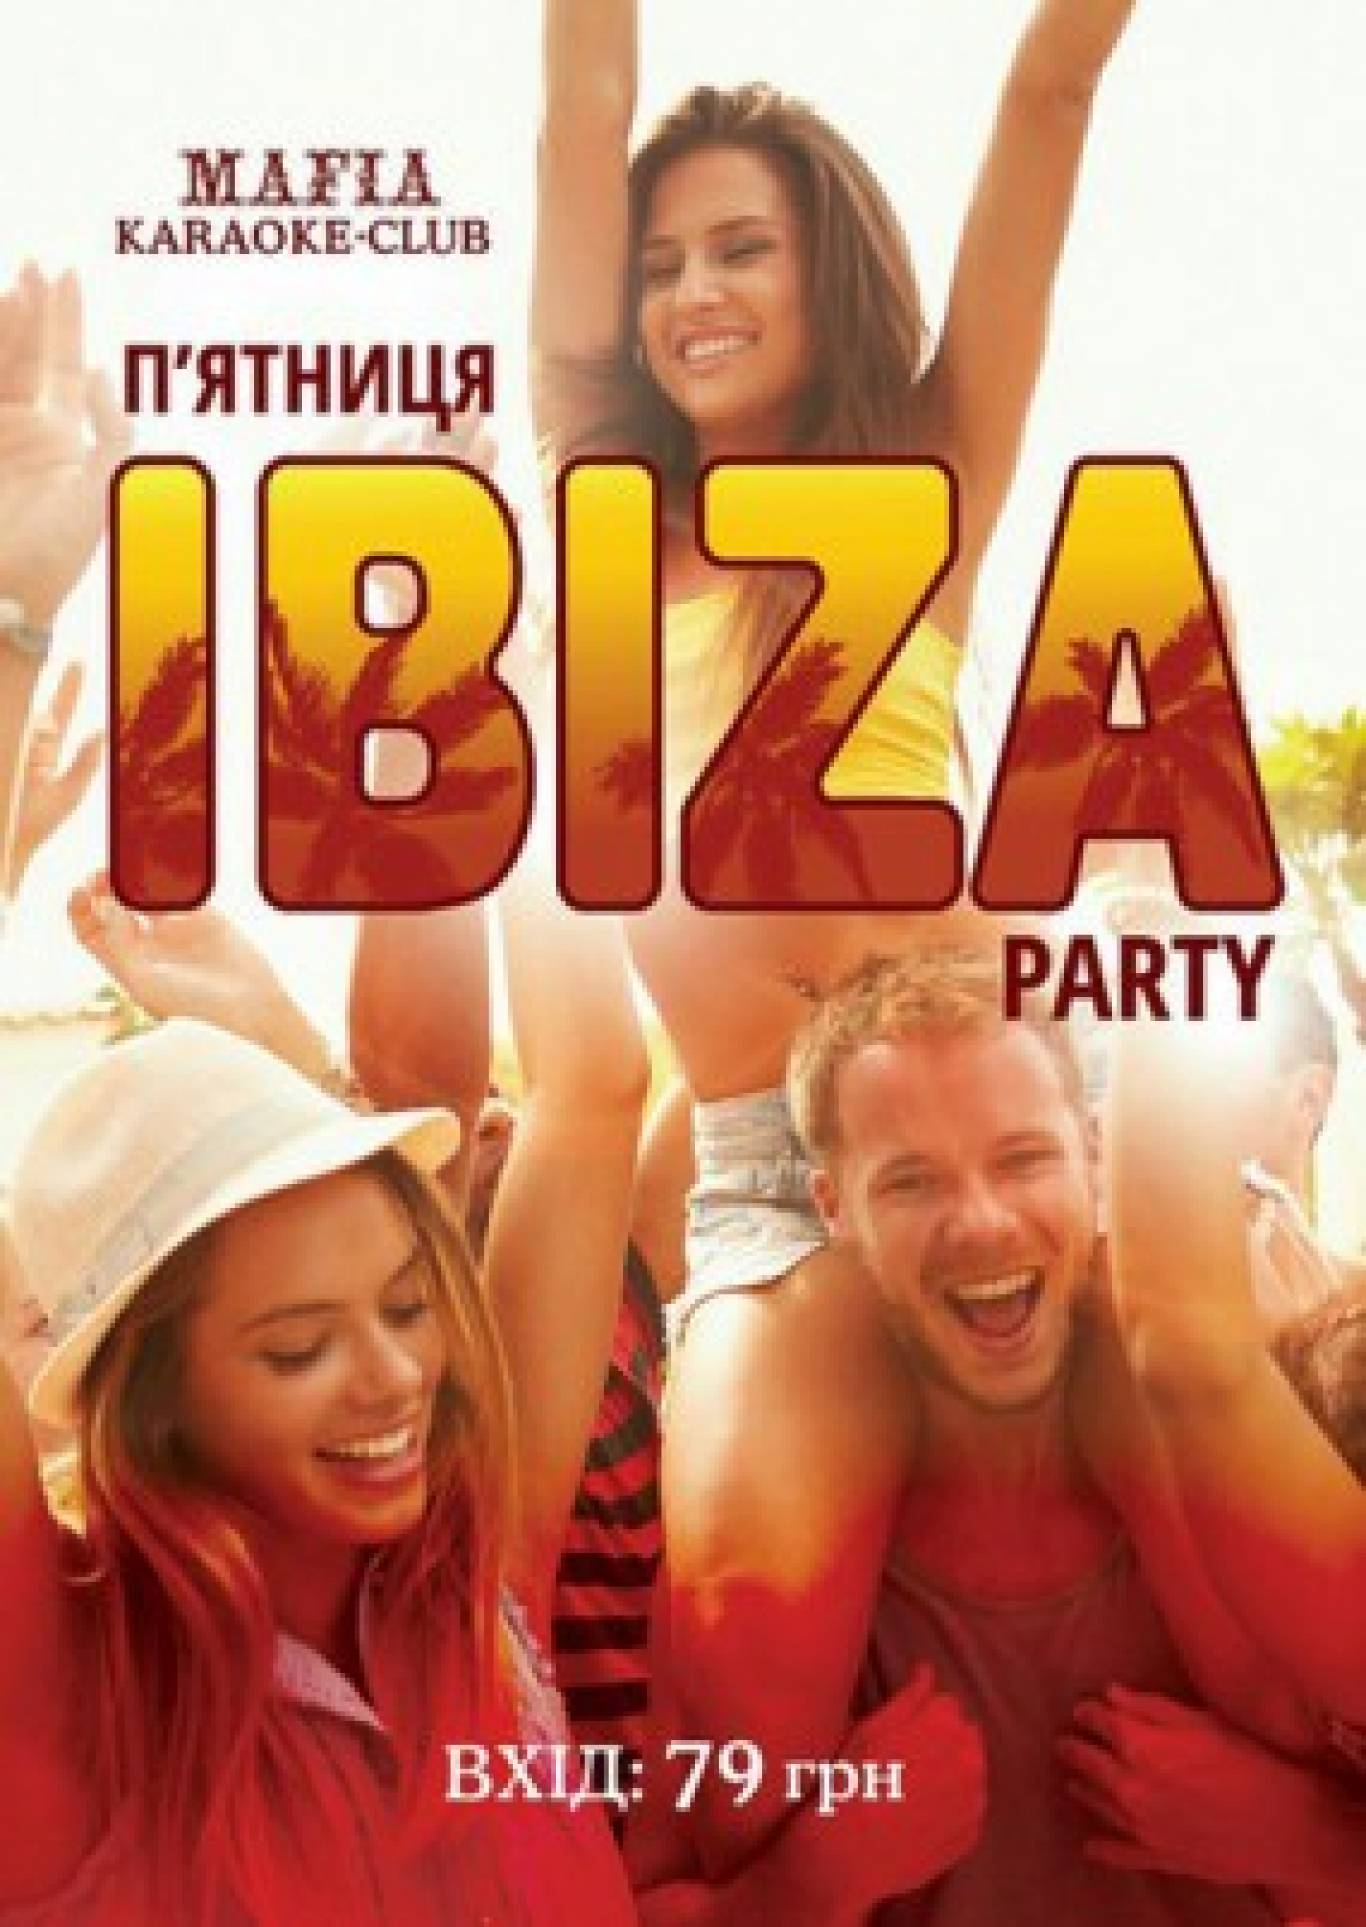 Ibiza Party у караоке-клубі Mafia